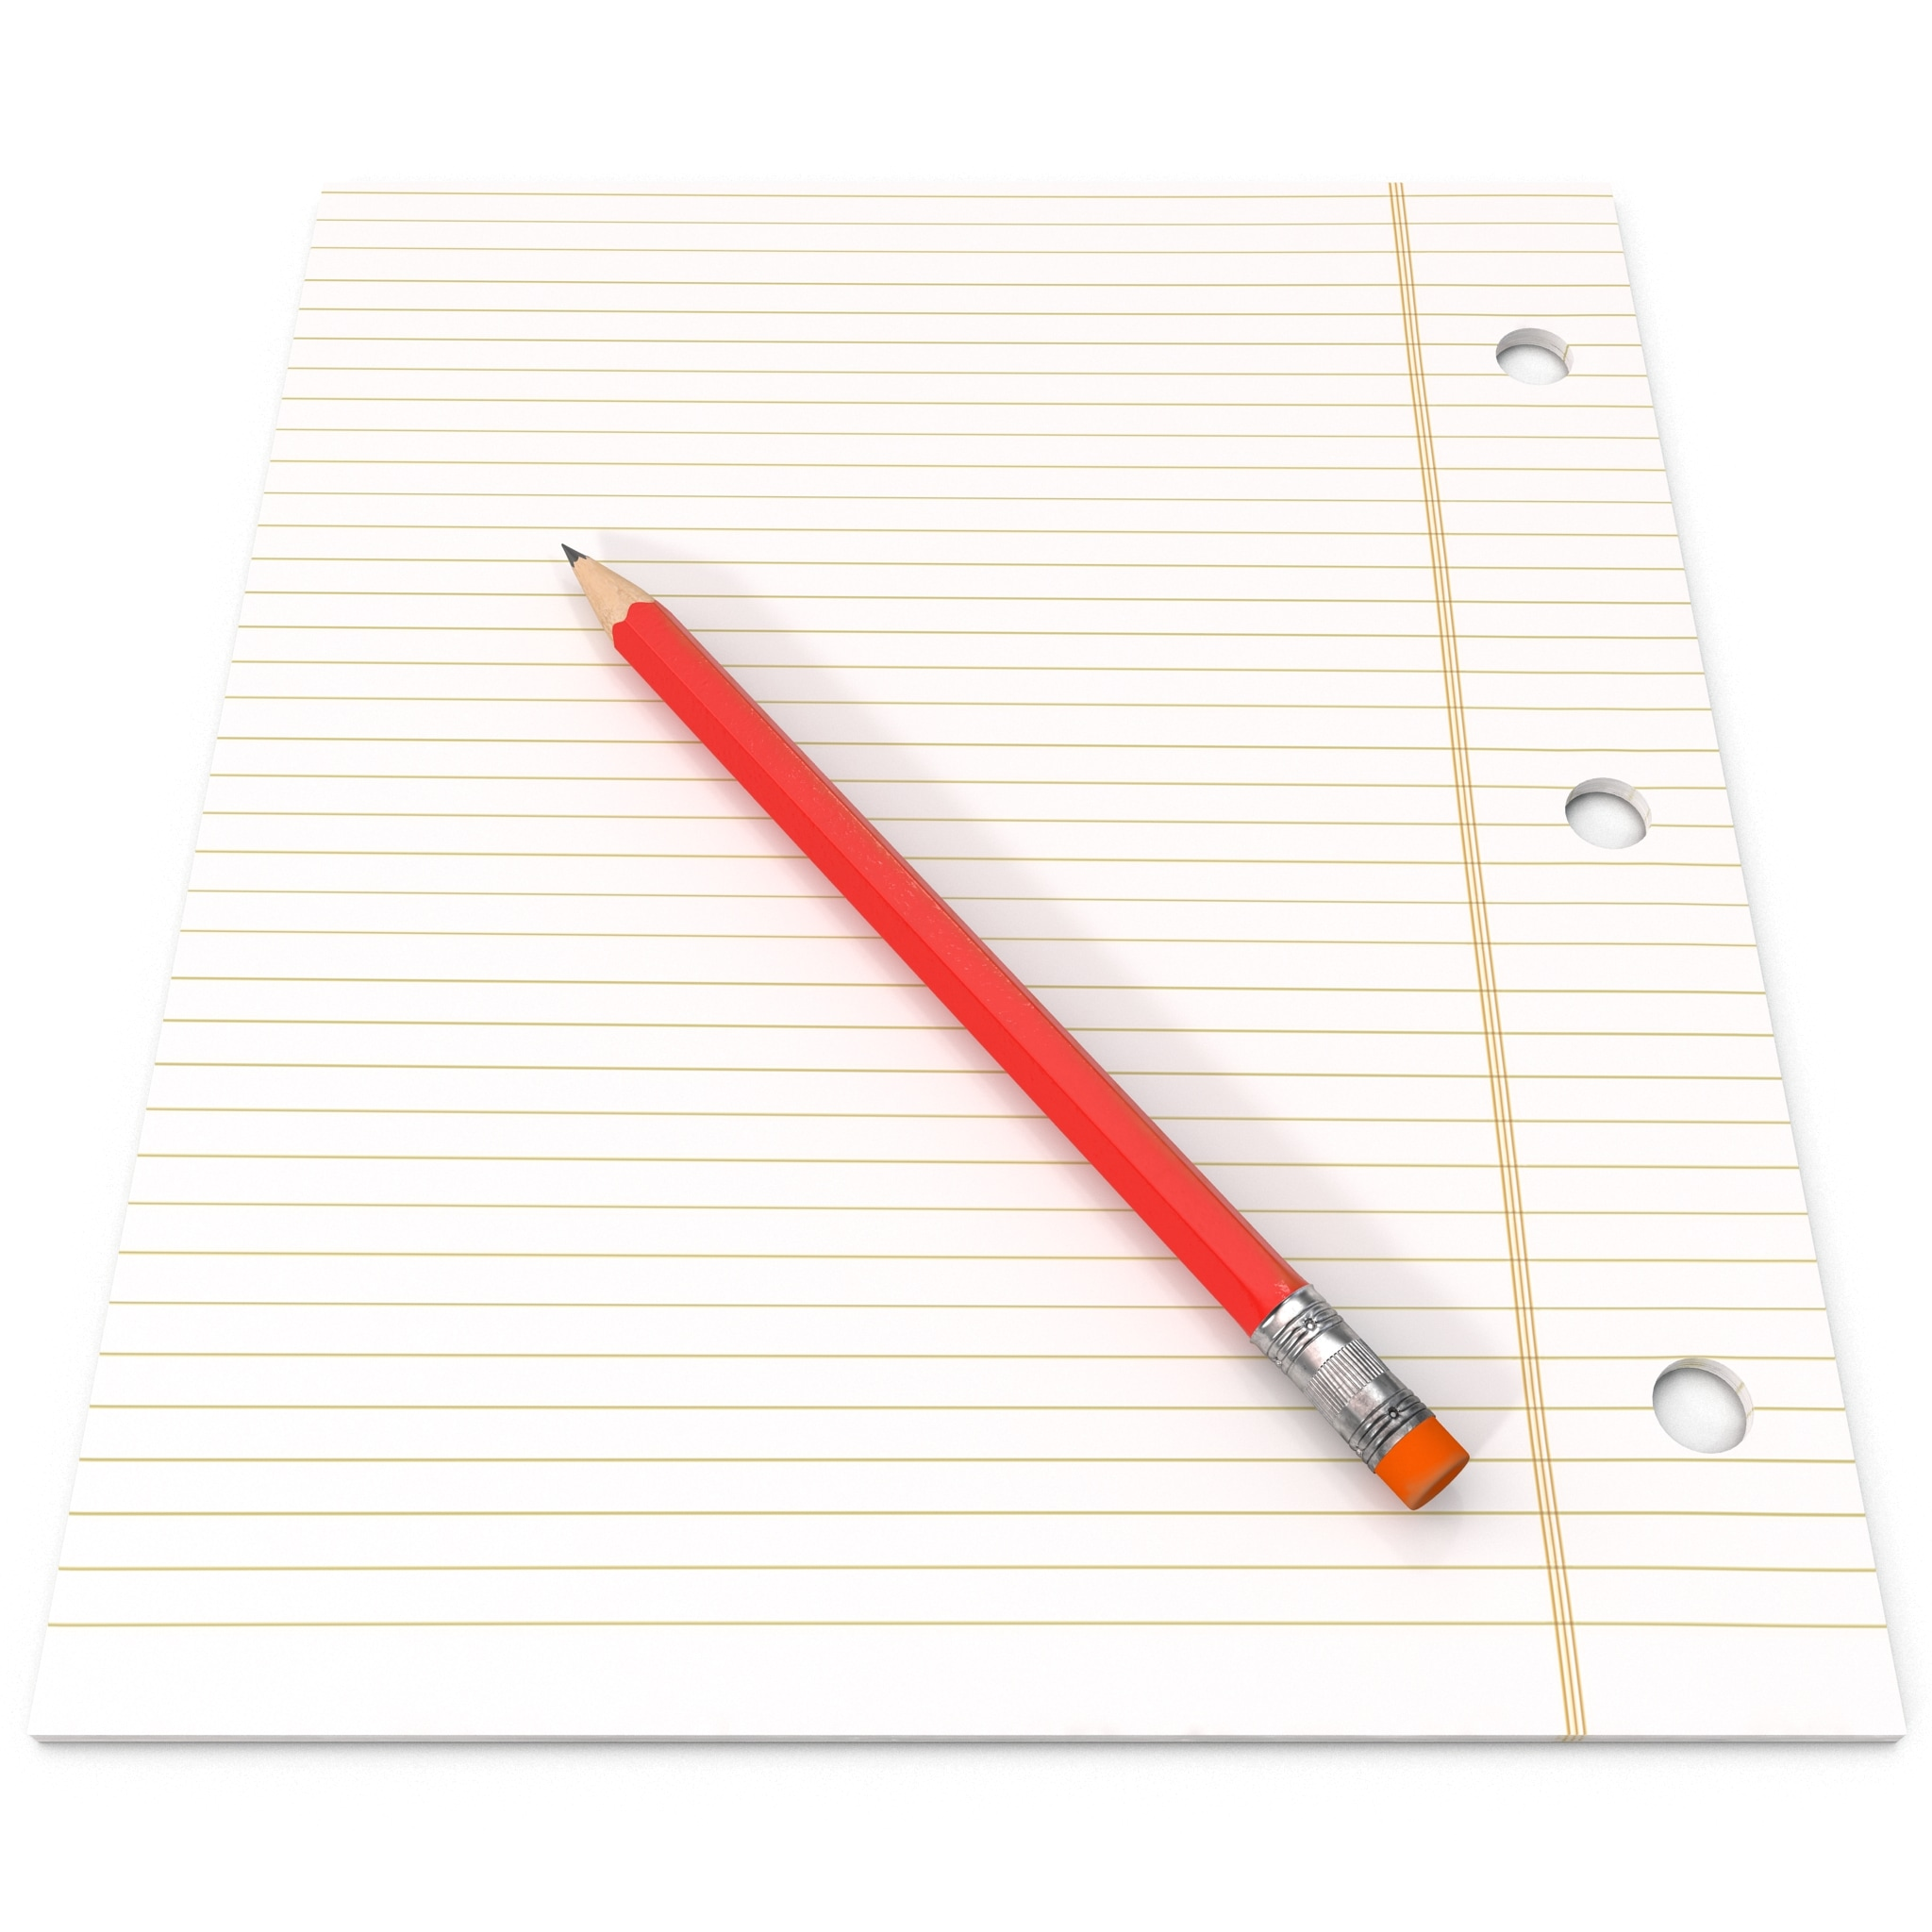 pencil note paper 3ds